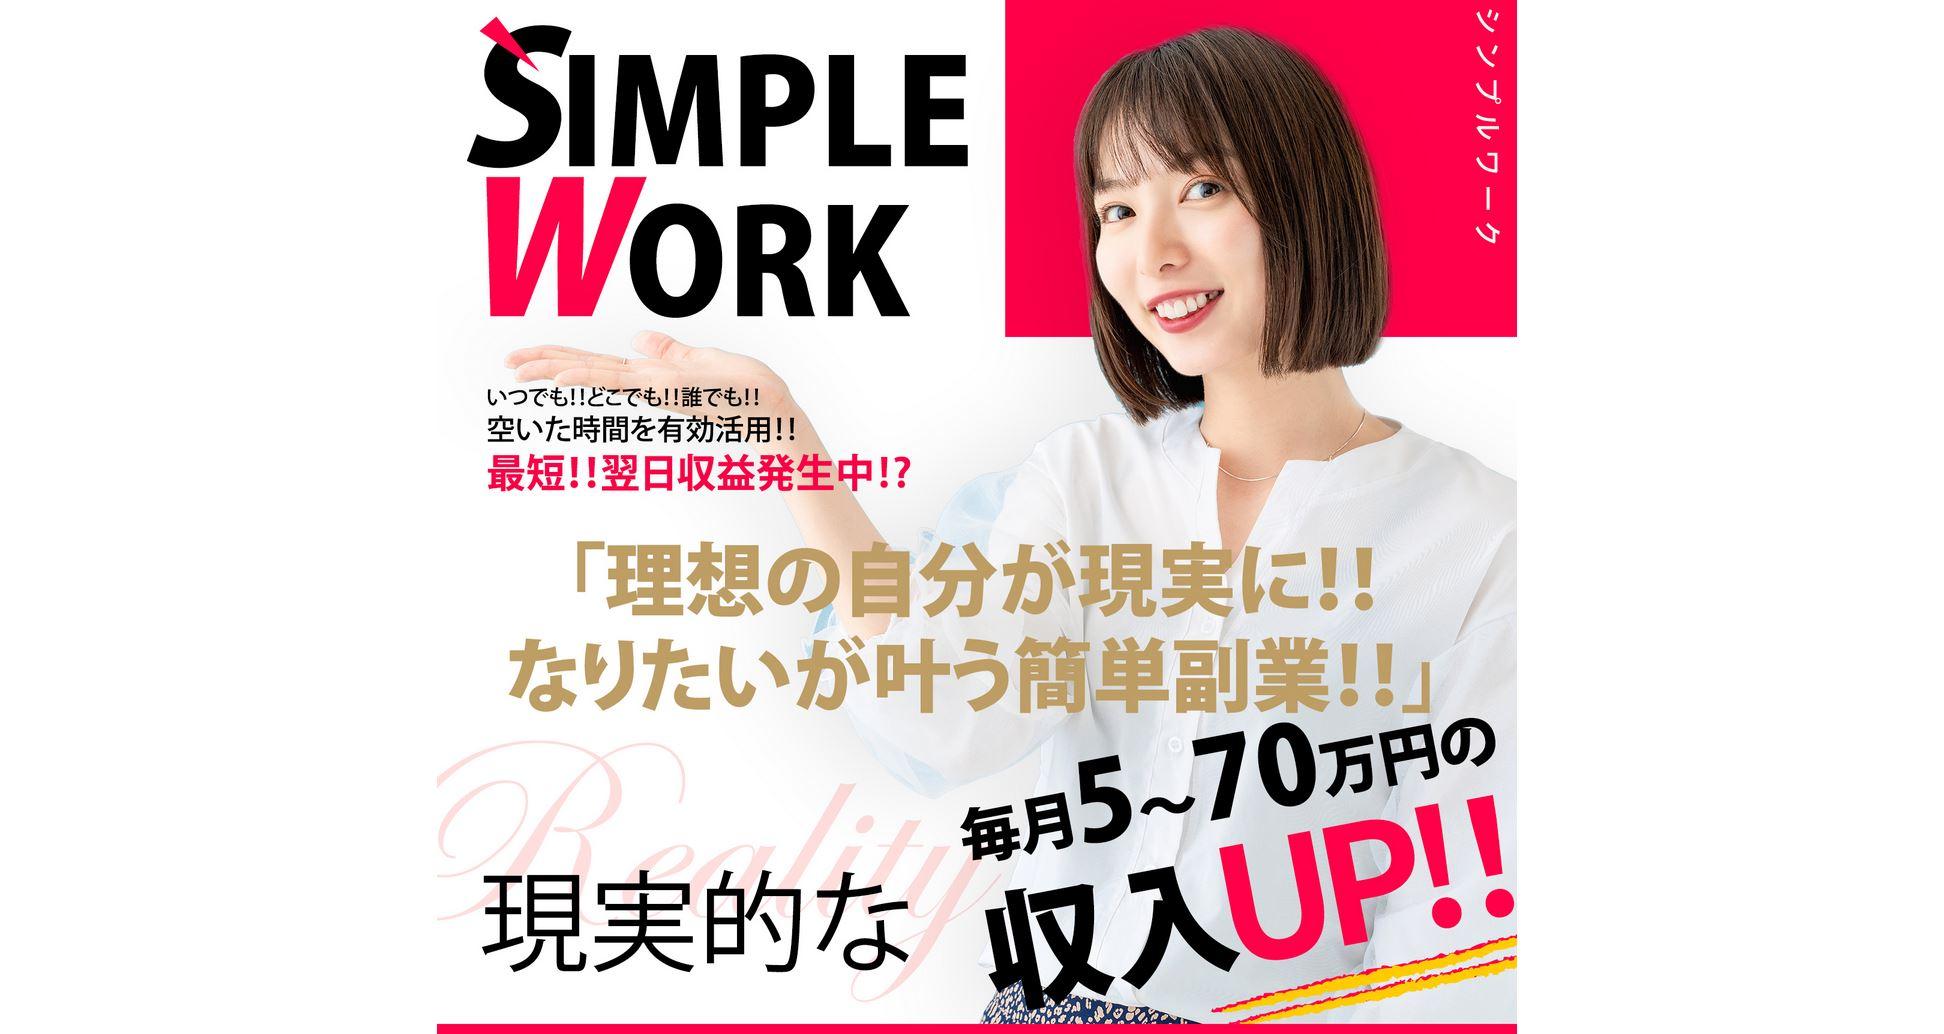 RS&カンパニー株式会社 SIMPLE WORKで毎月5~70万円を稼げる?